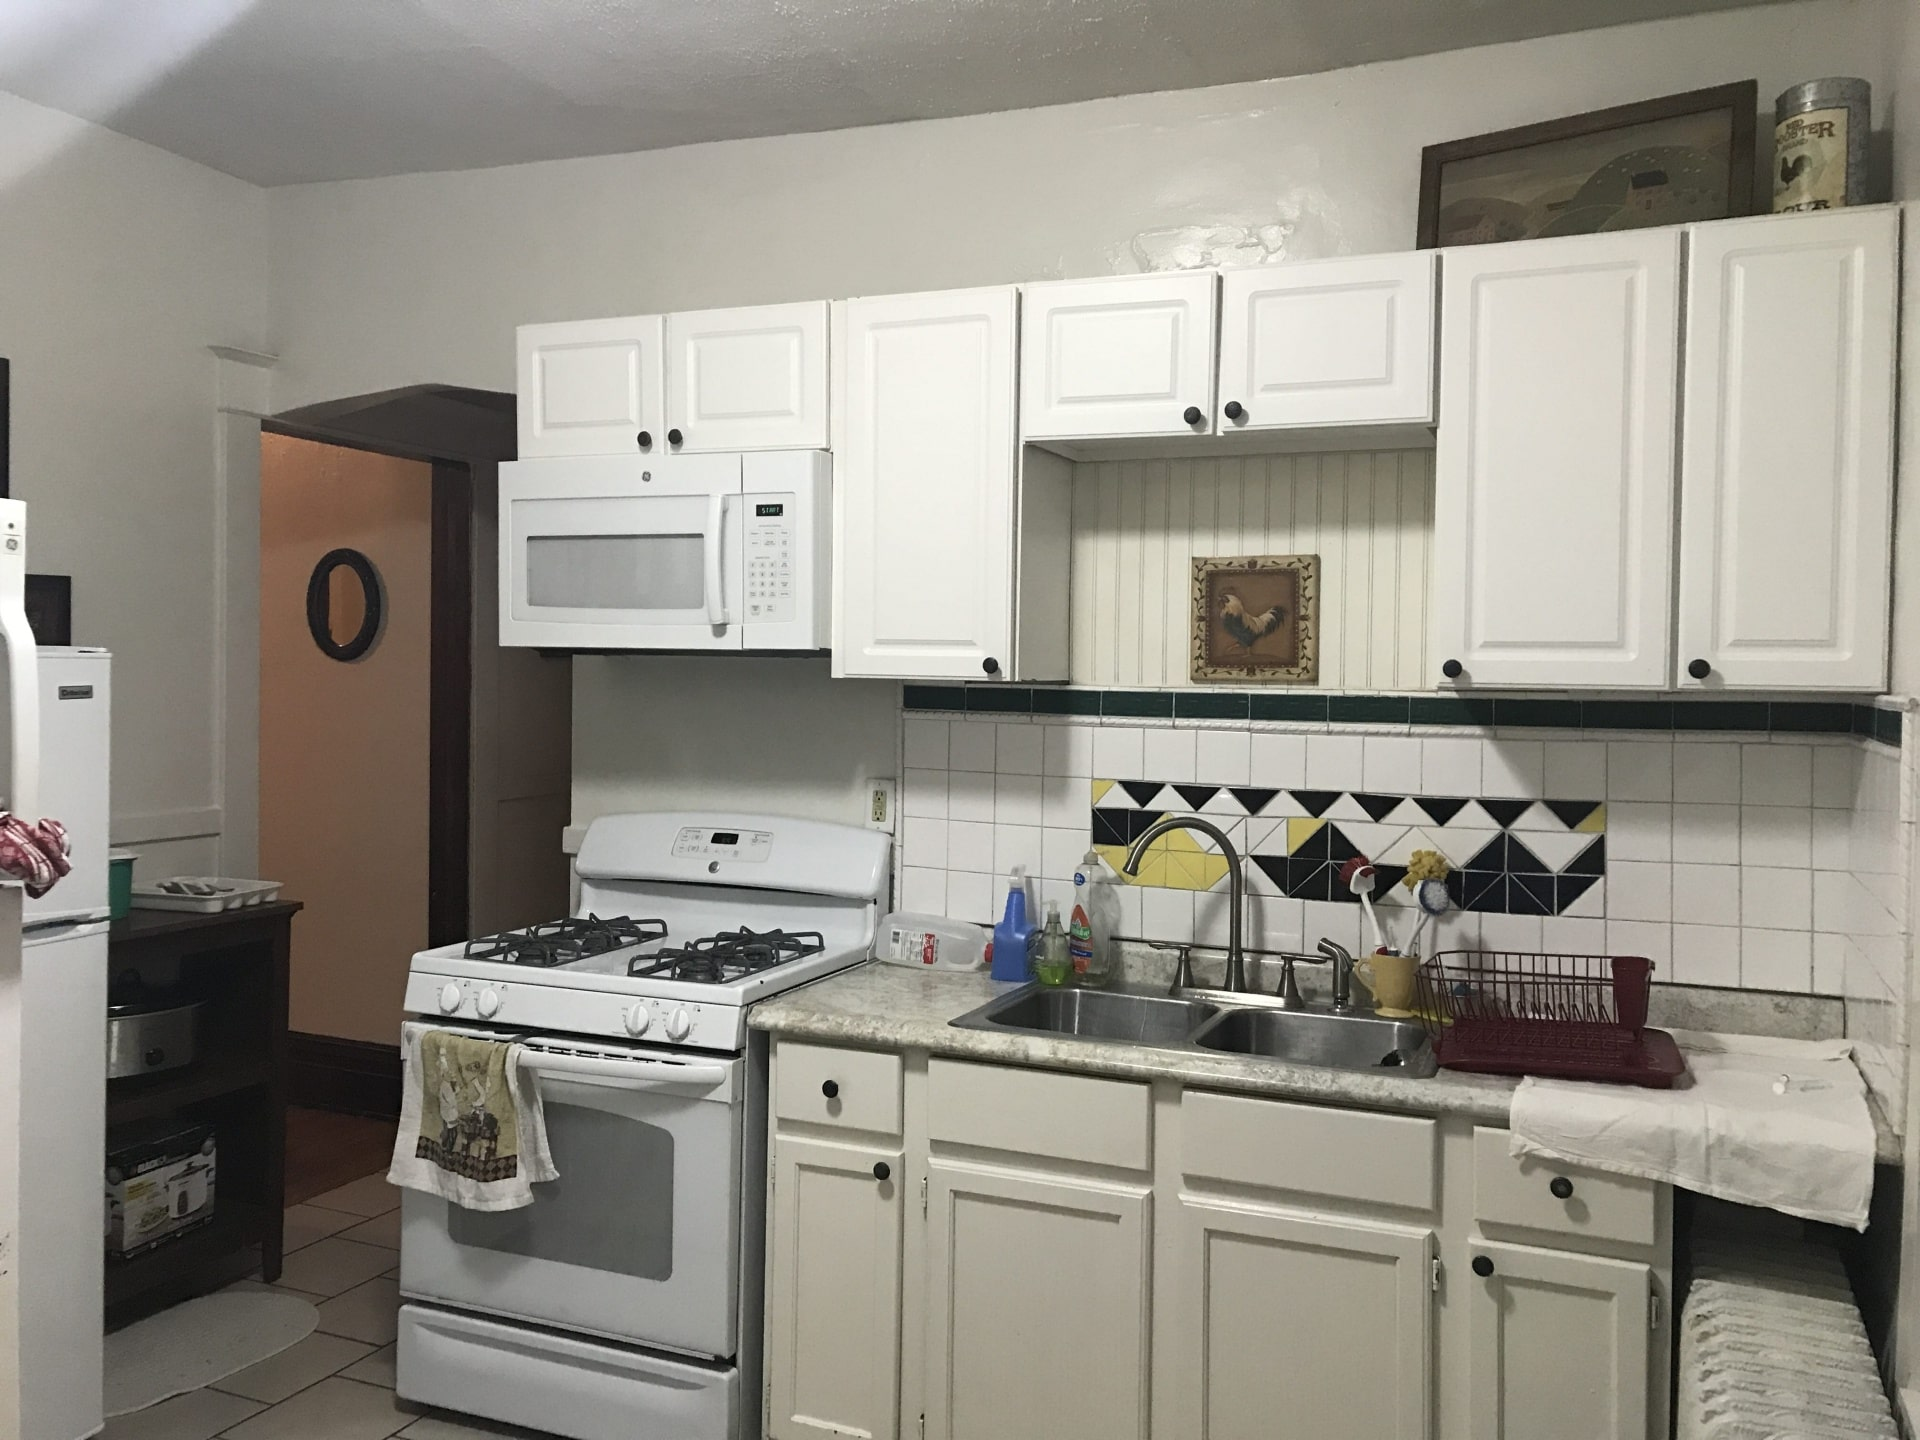 The Beech House Kitchen